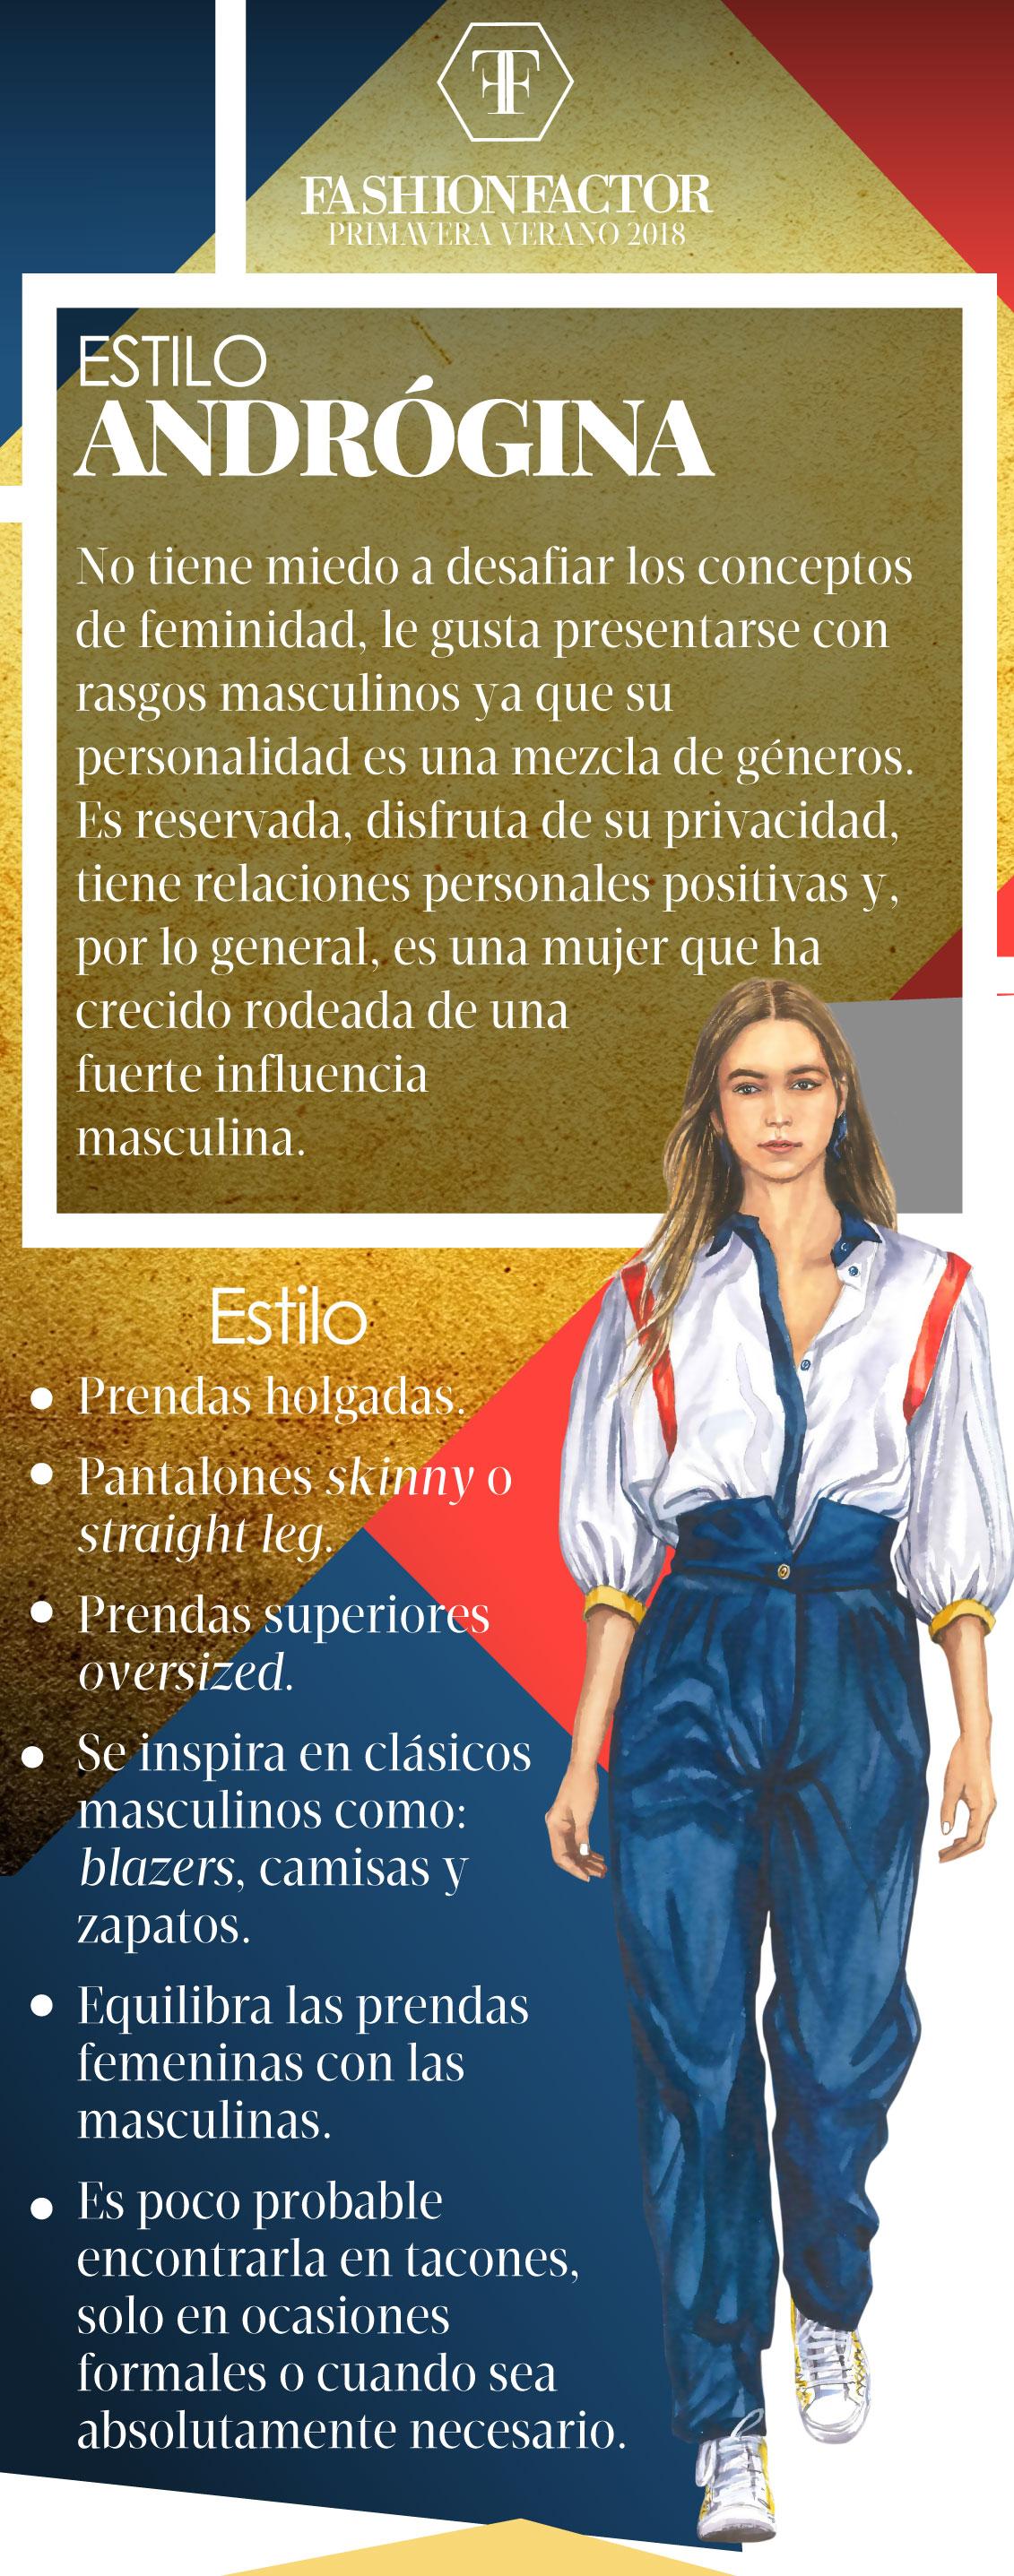 Fashion Estilo Factor Identifica Tu Andrógina Revista tdCQrhsx